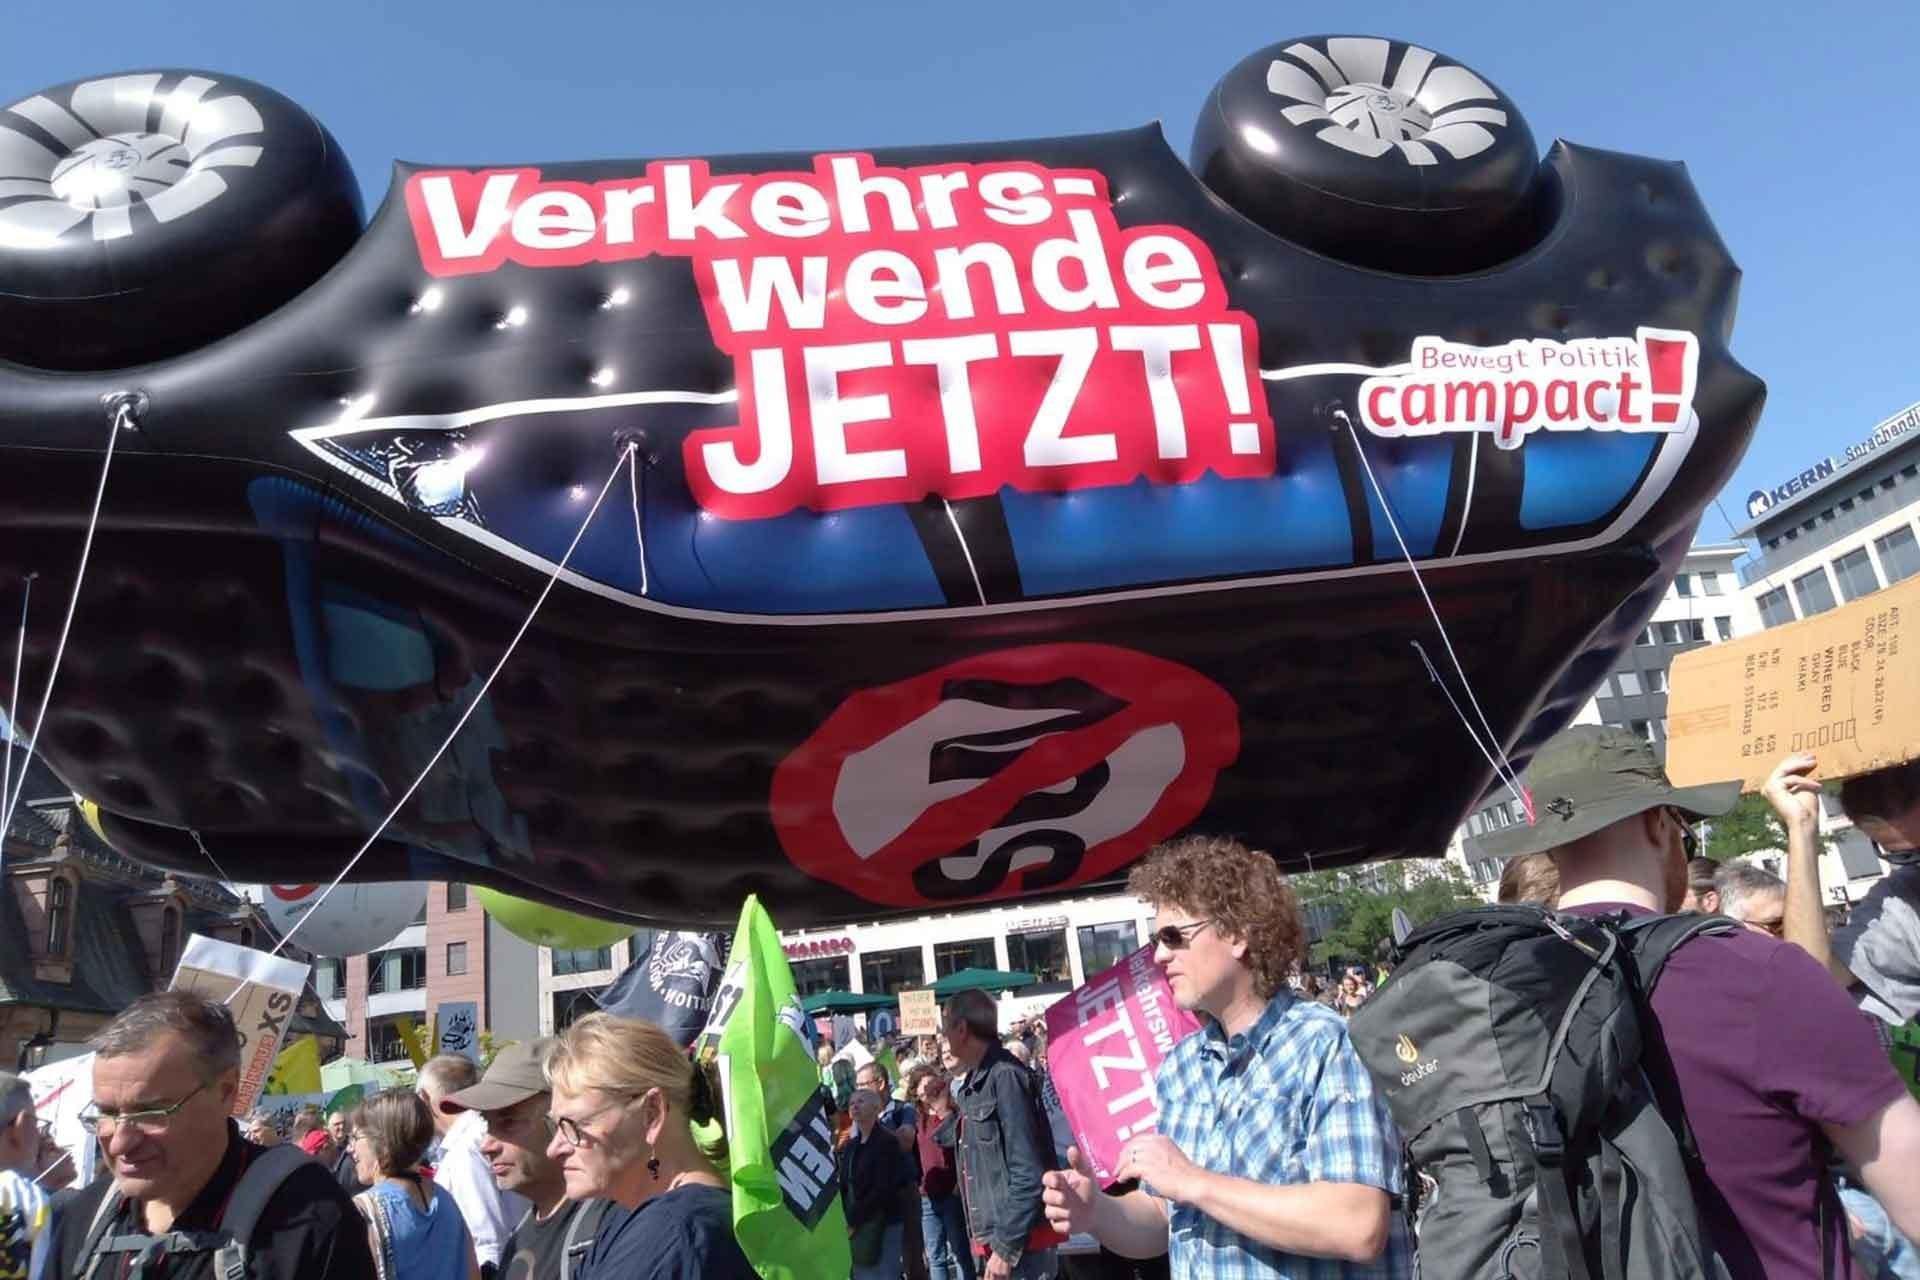 Frankfurt'ta 25 bin kişi otomobil fuarını protesto etti